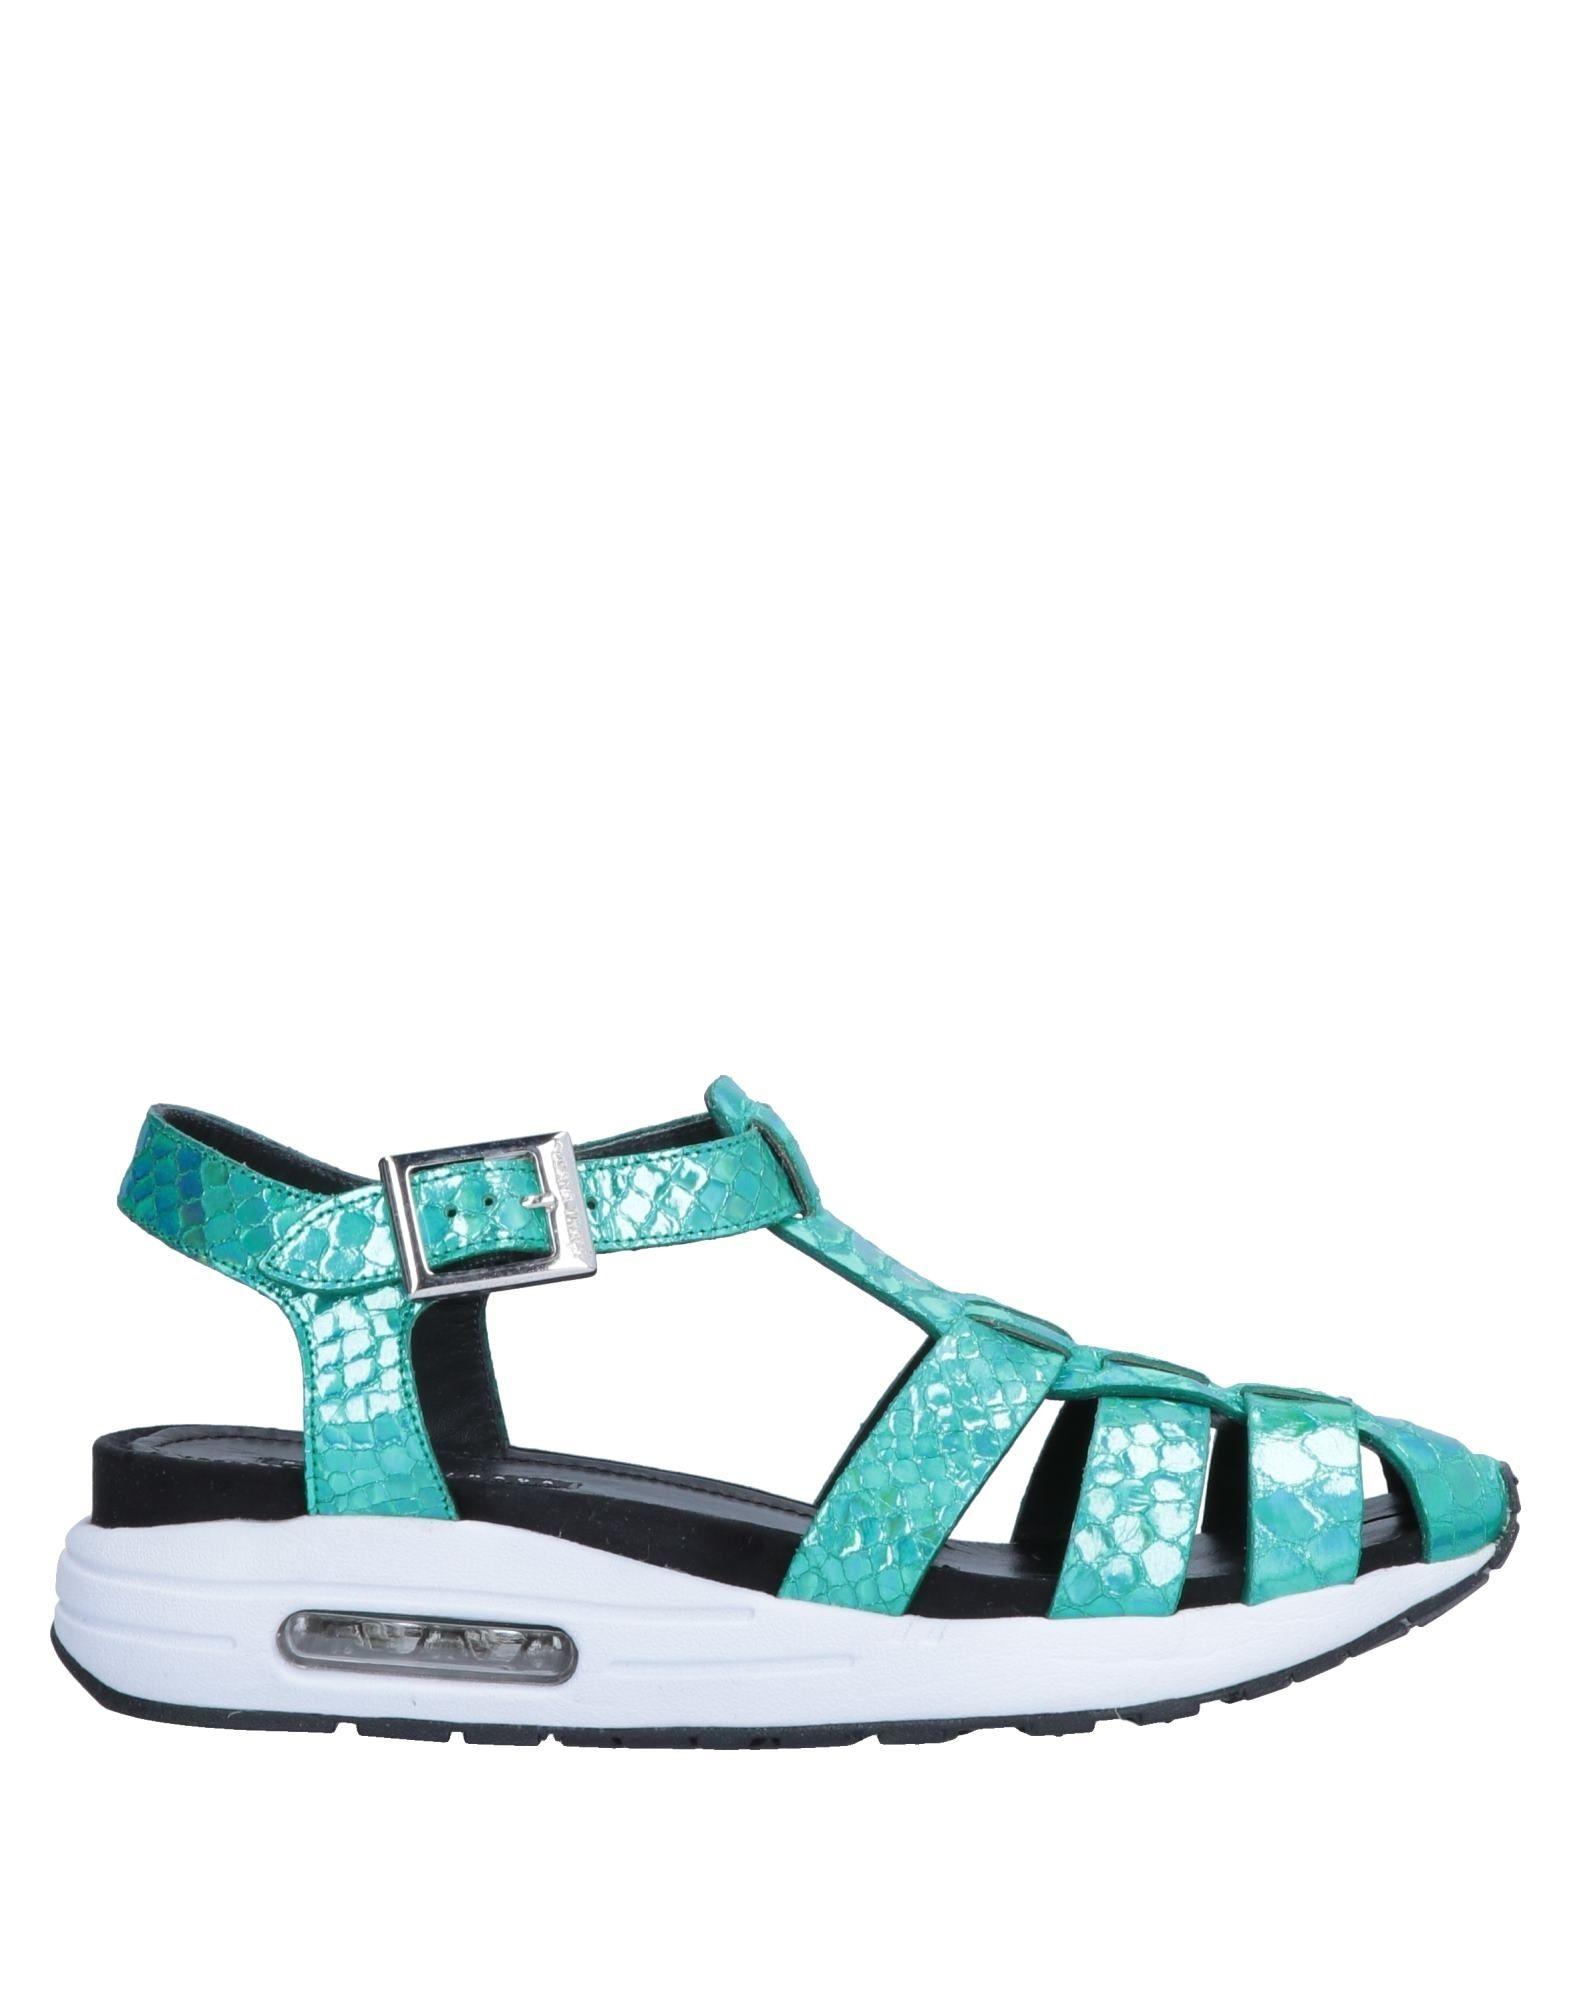 Gut um billige Schuhe zu tragenSusana 11550346JE Traca Sandalen Damen  11550346JE tragenSusana e98eeb